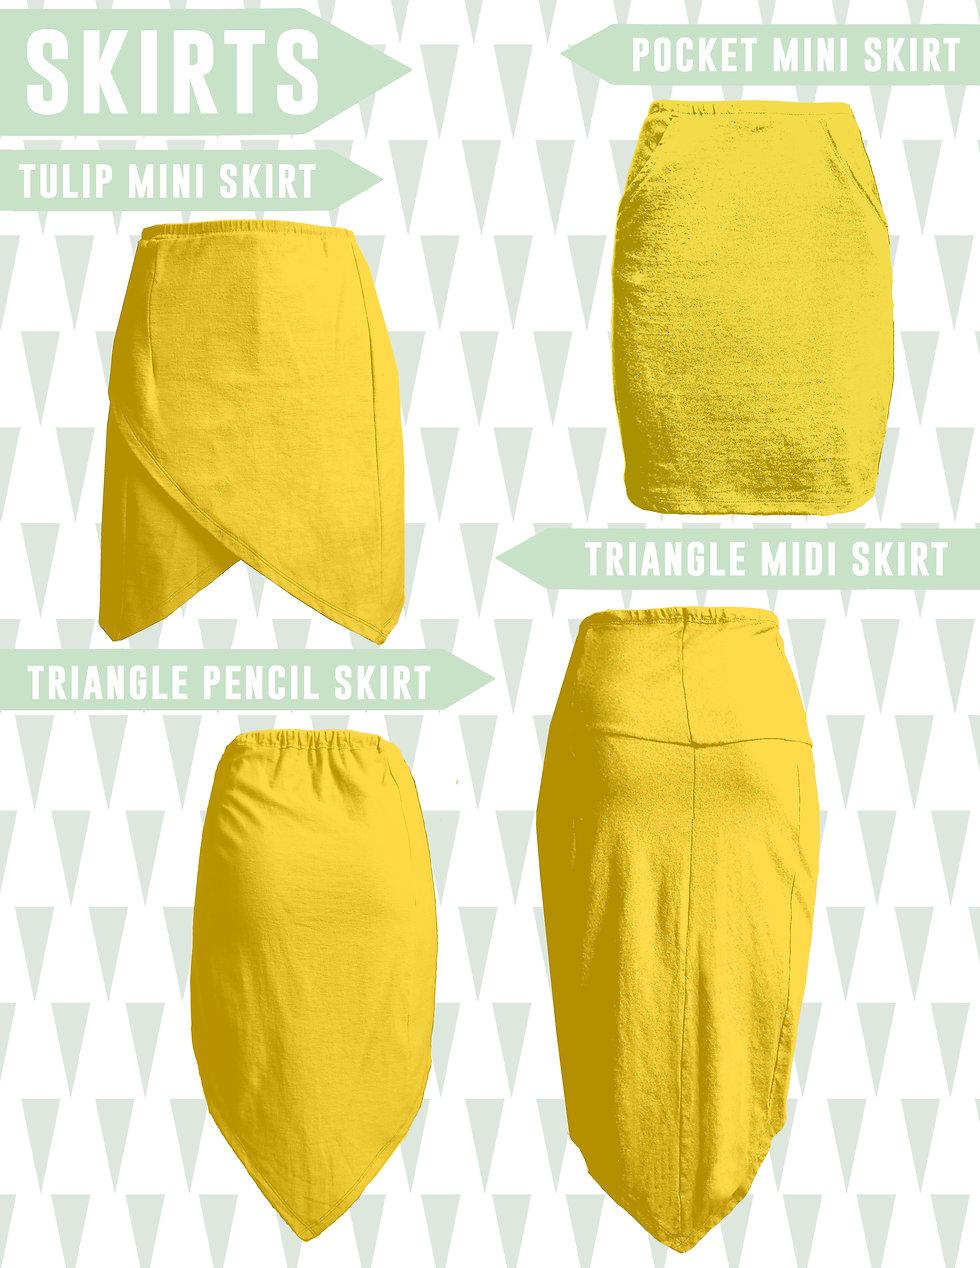 Ecofashion Brand Look Book Skirts